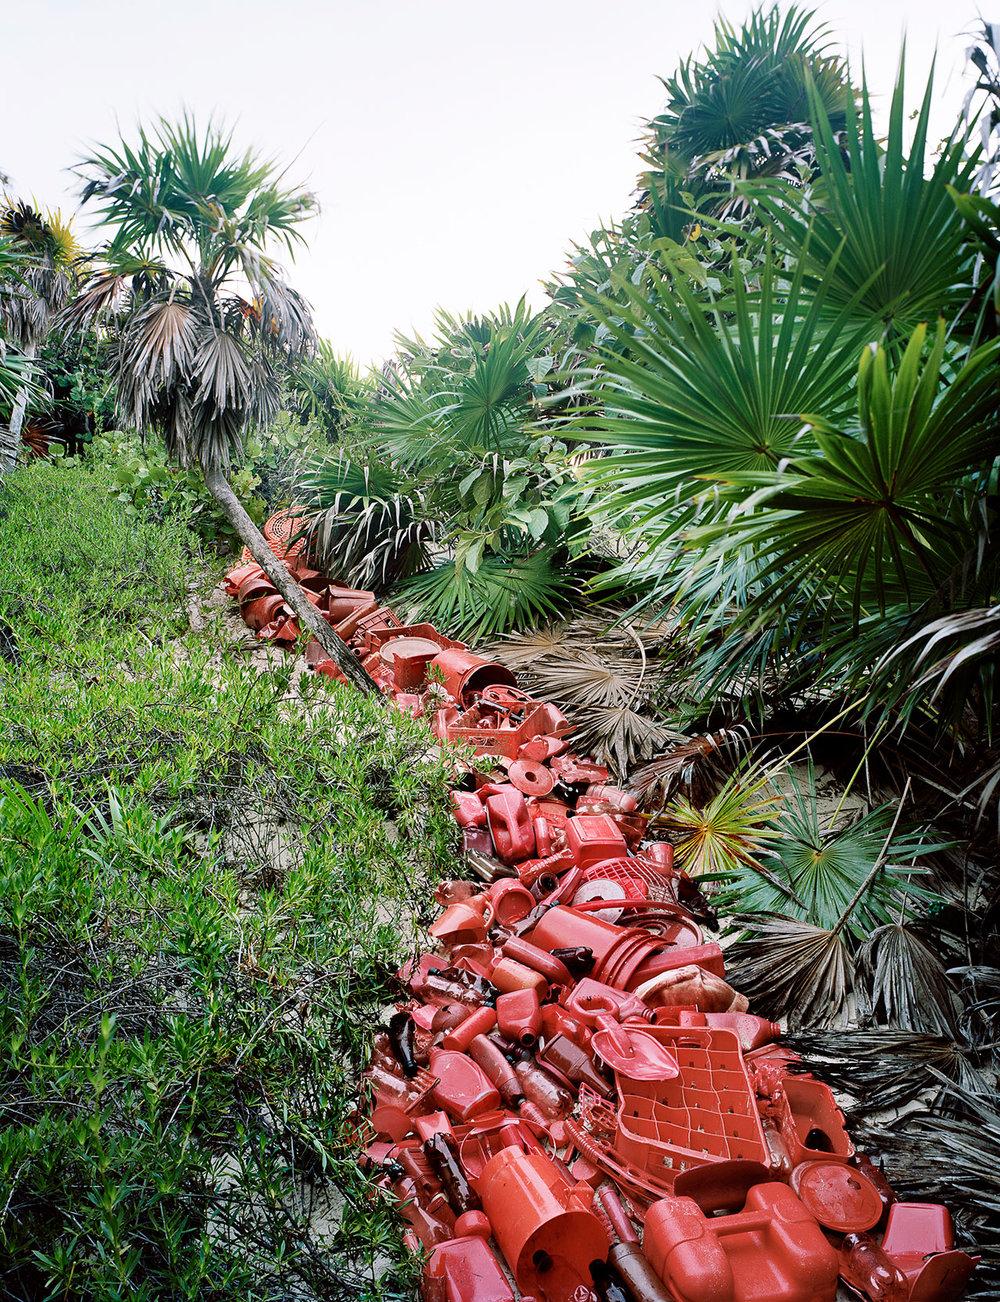 s3_photoviz_gestalten_alejandro_duran_washed_up_transforming_a_trashed_landscape_yatzer.jpg